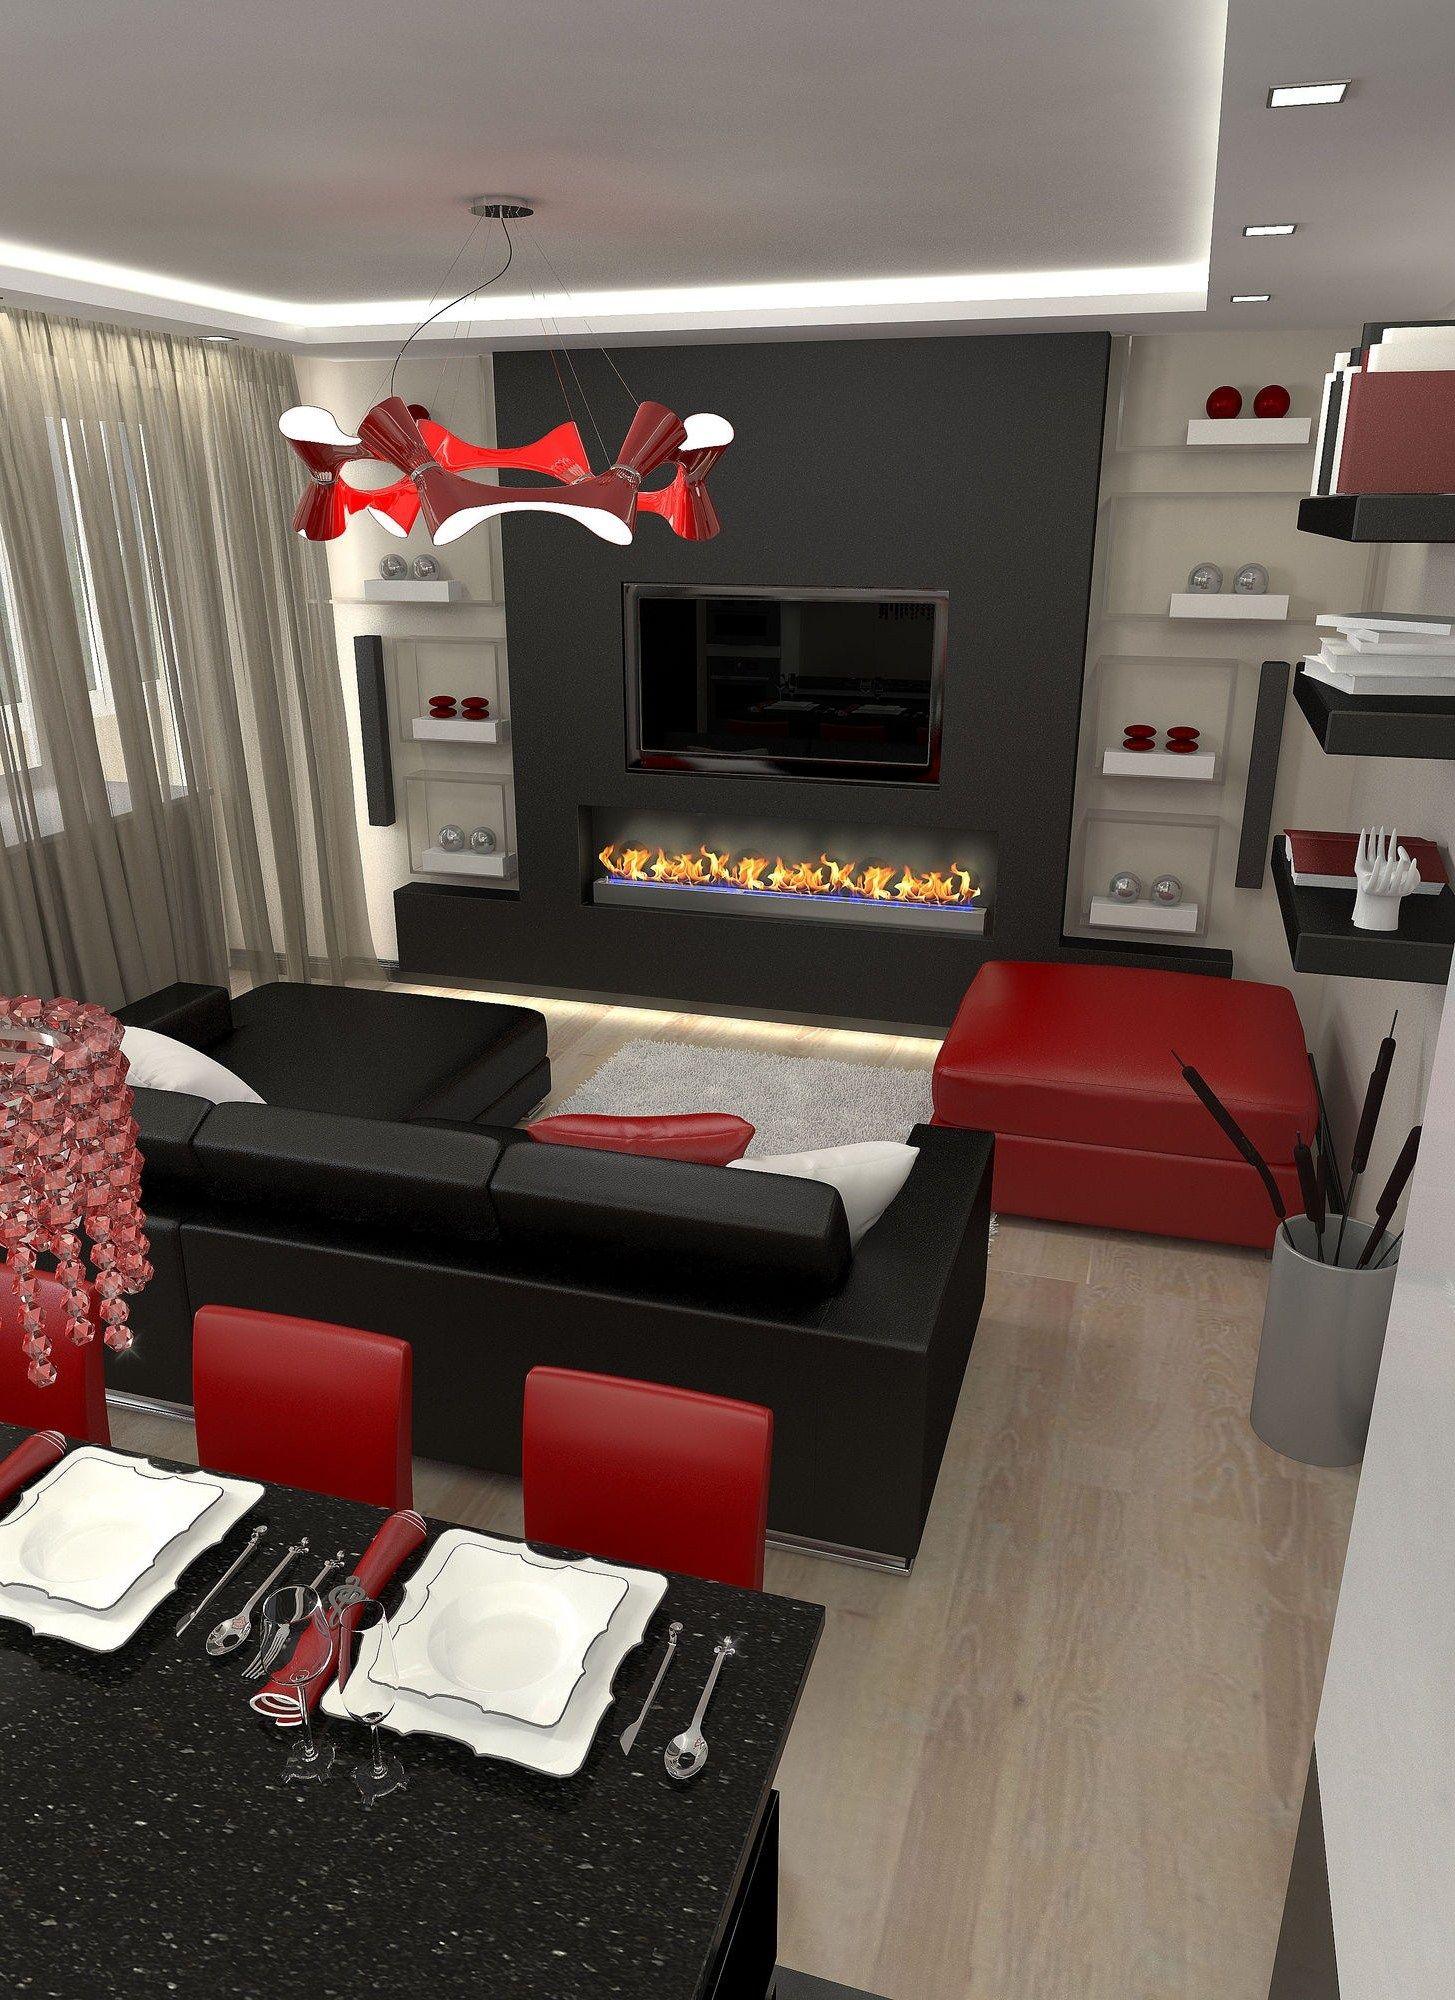 164 Black Living Room Ideas Home Red Living Room Decor Red Room Decor White Living Room Decor #red #and #gray #living #room #ideas